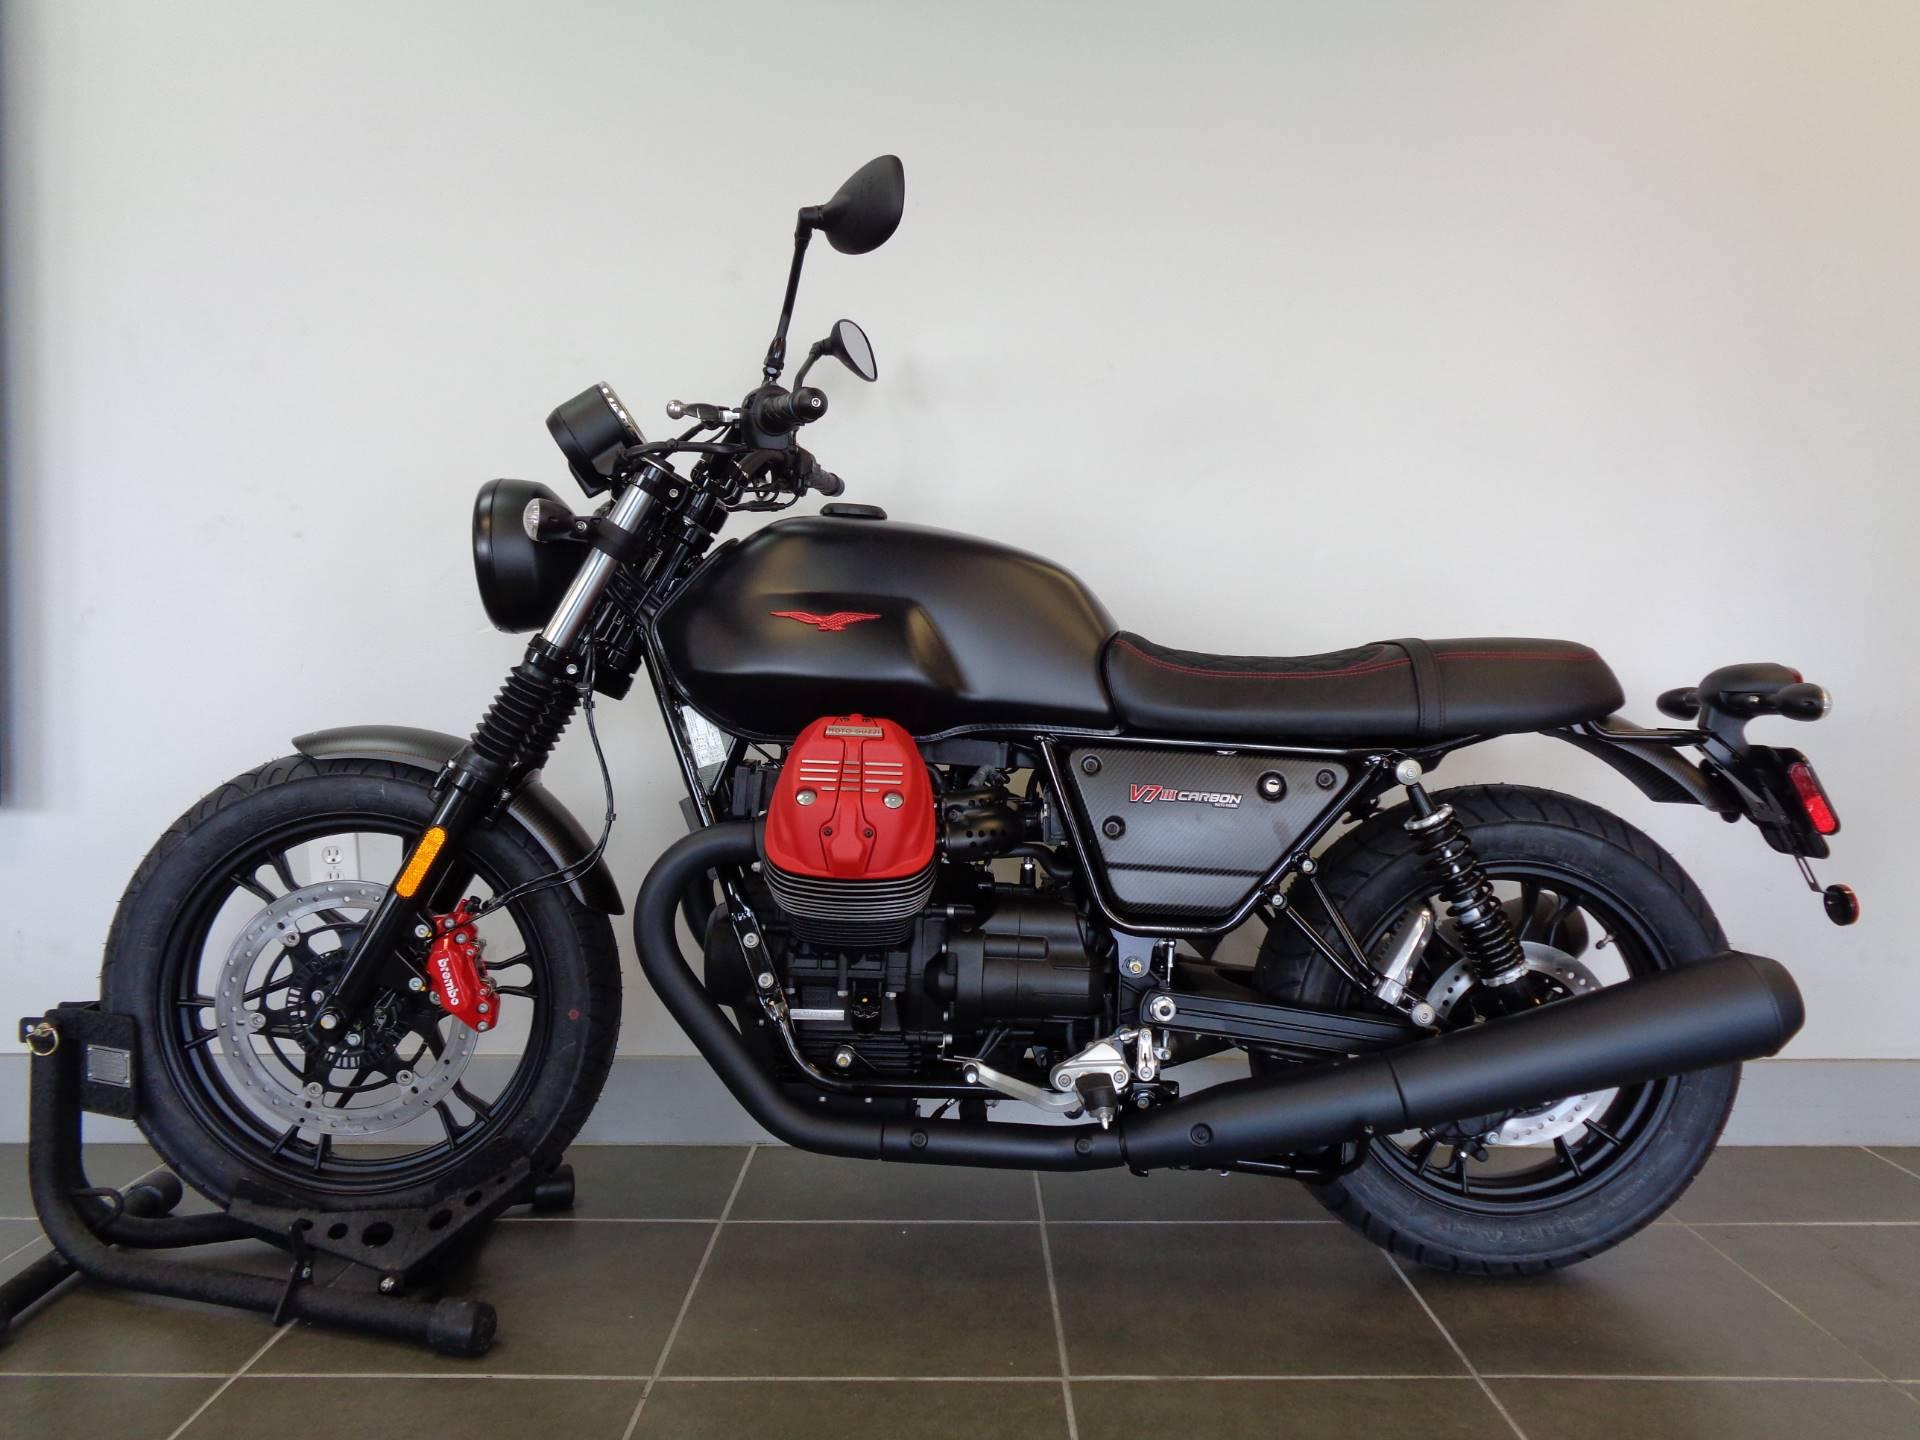 2018 Moto Guzzi V7 III Carbon Dark 11